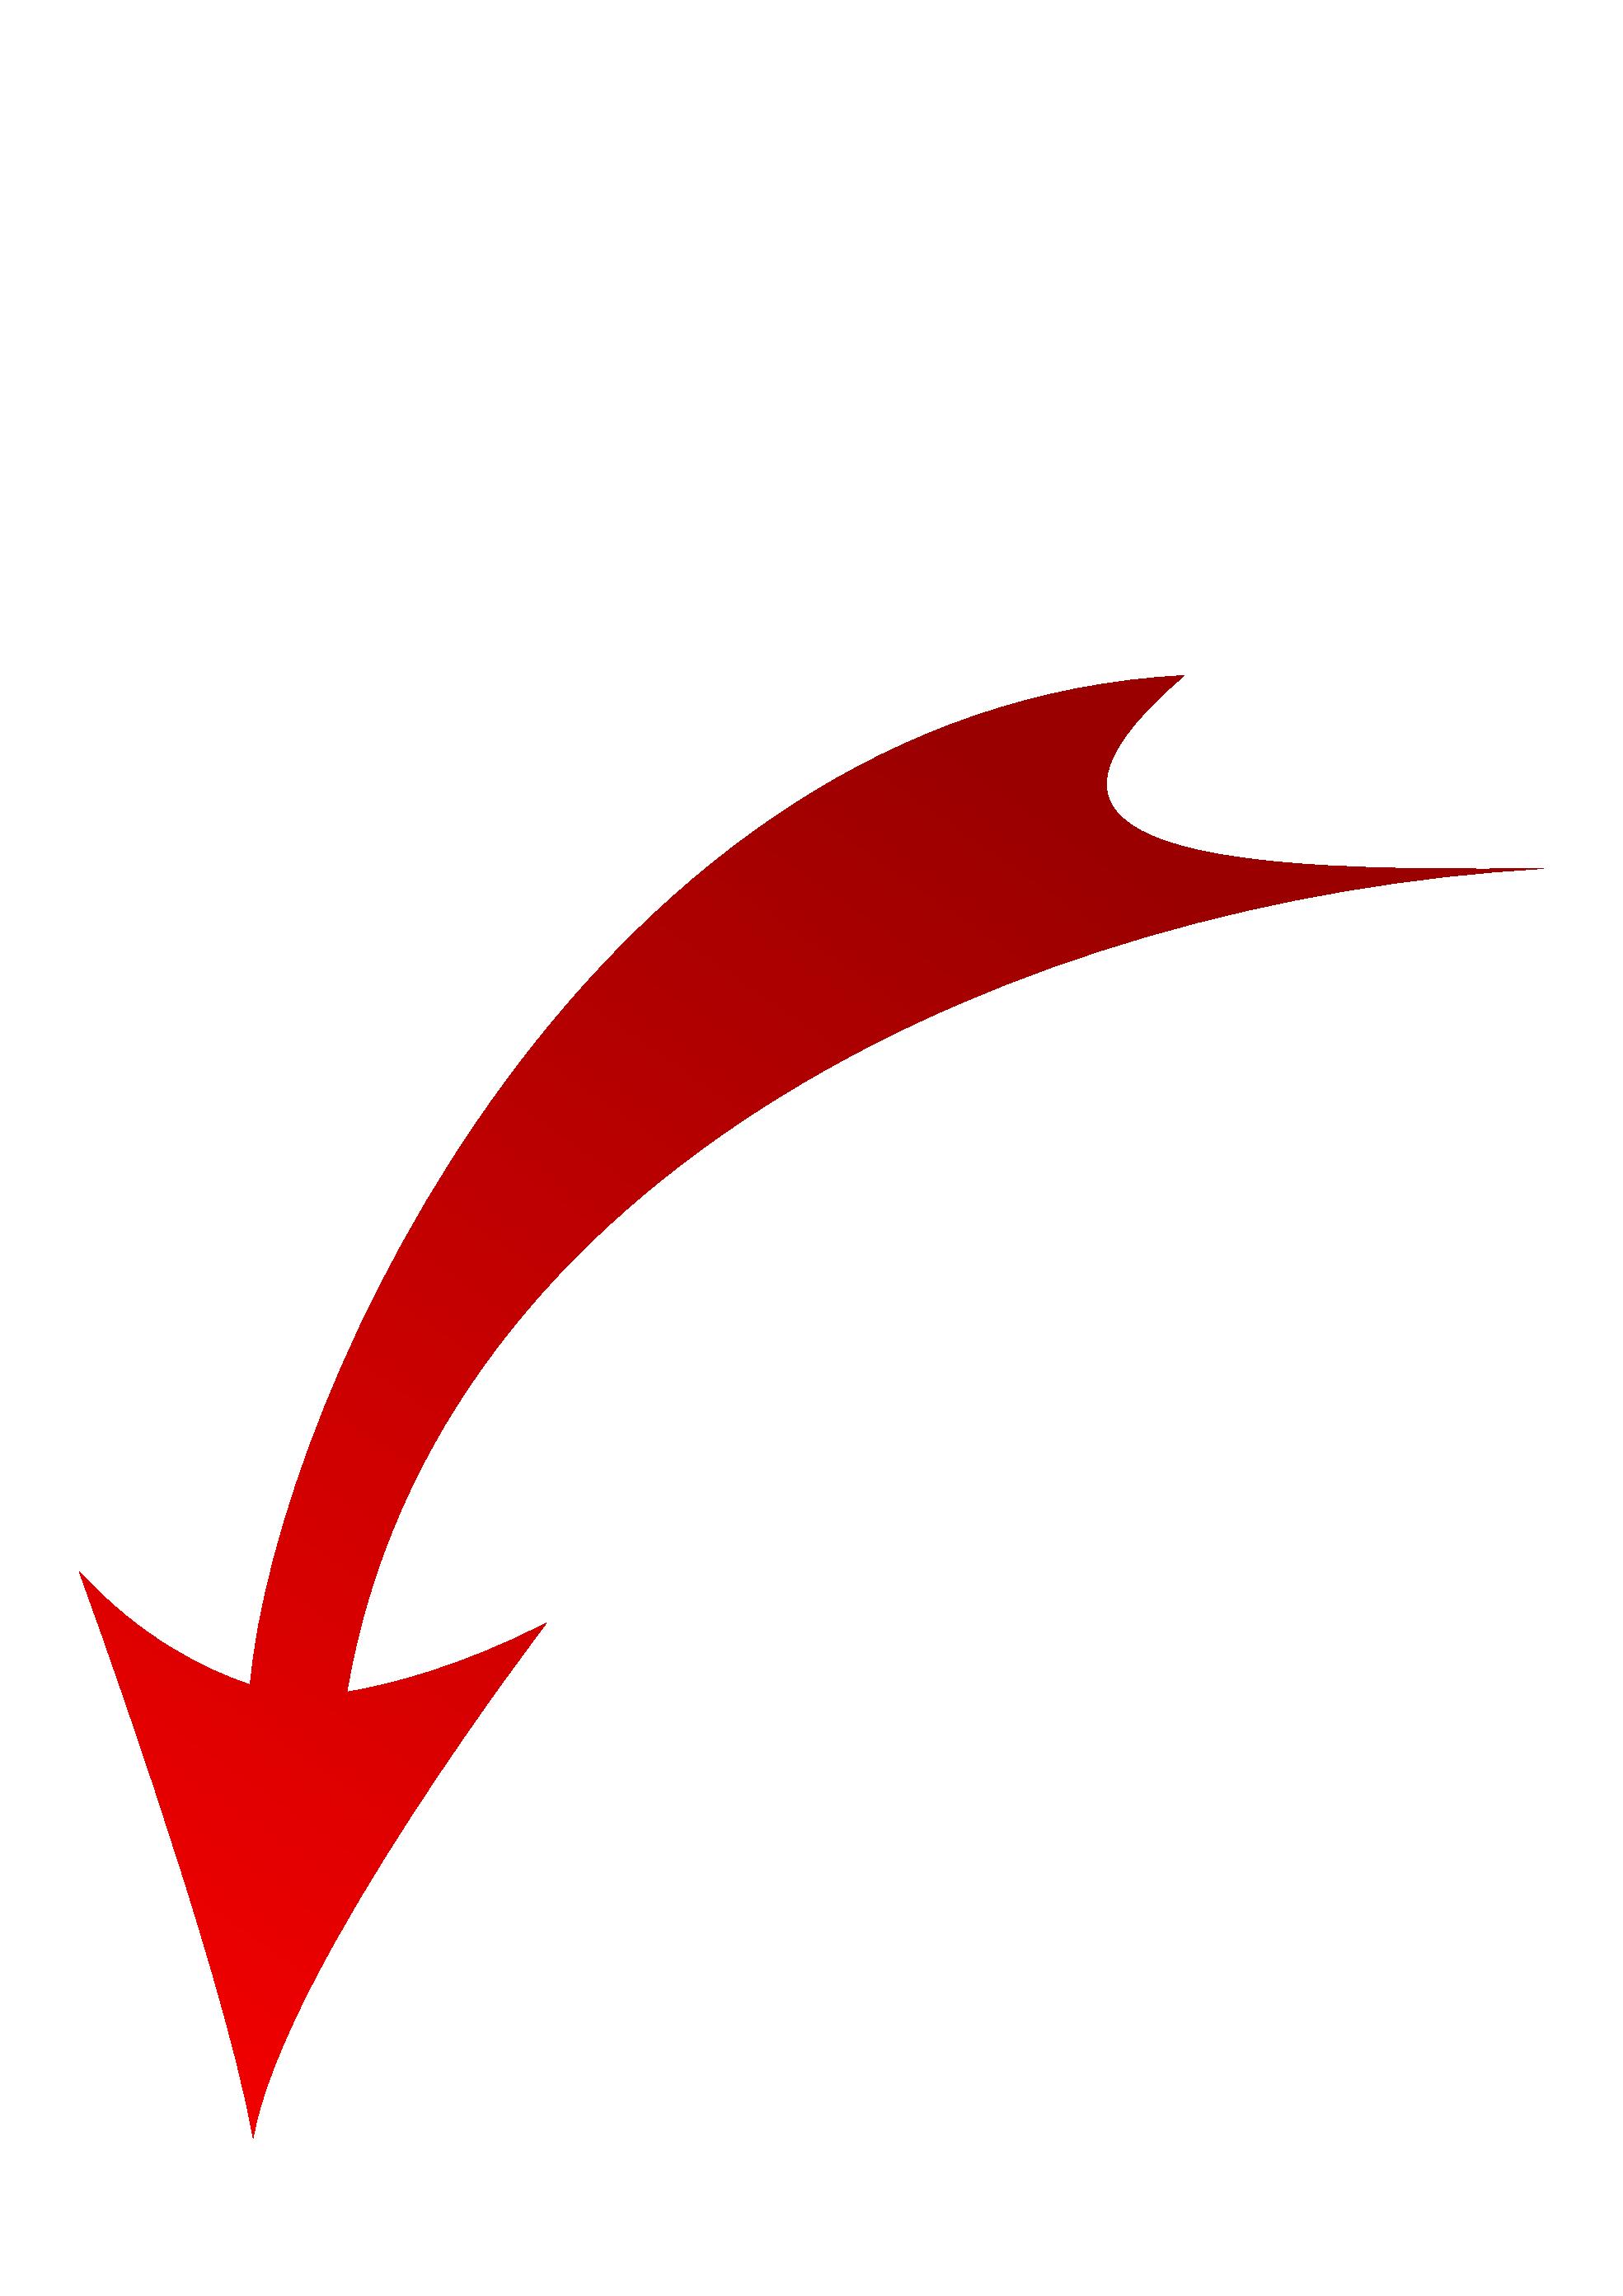 Red Down Arrow Transparent